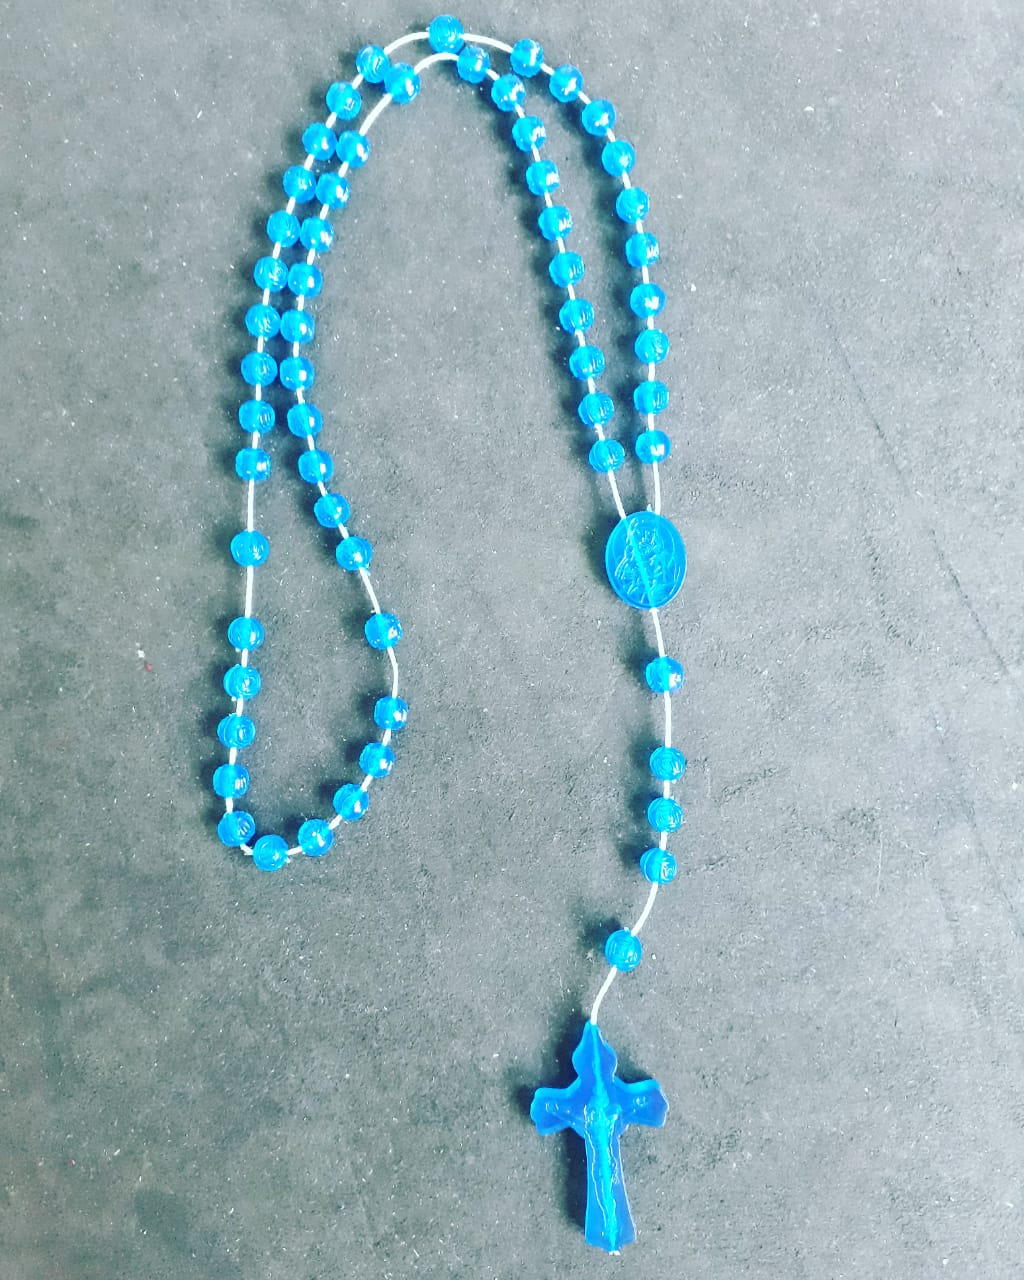 T192 - Terço Plastico Flor 4mm Azul  - VindVedShop - Distribuidora Catolica